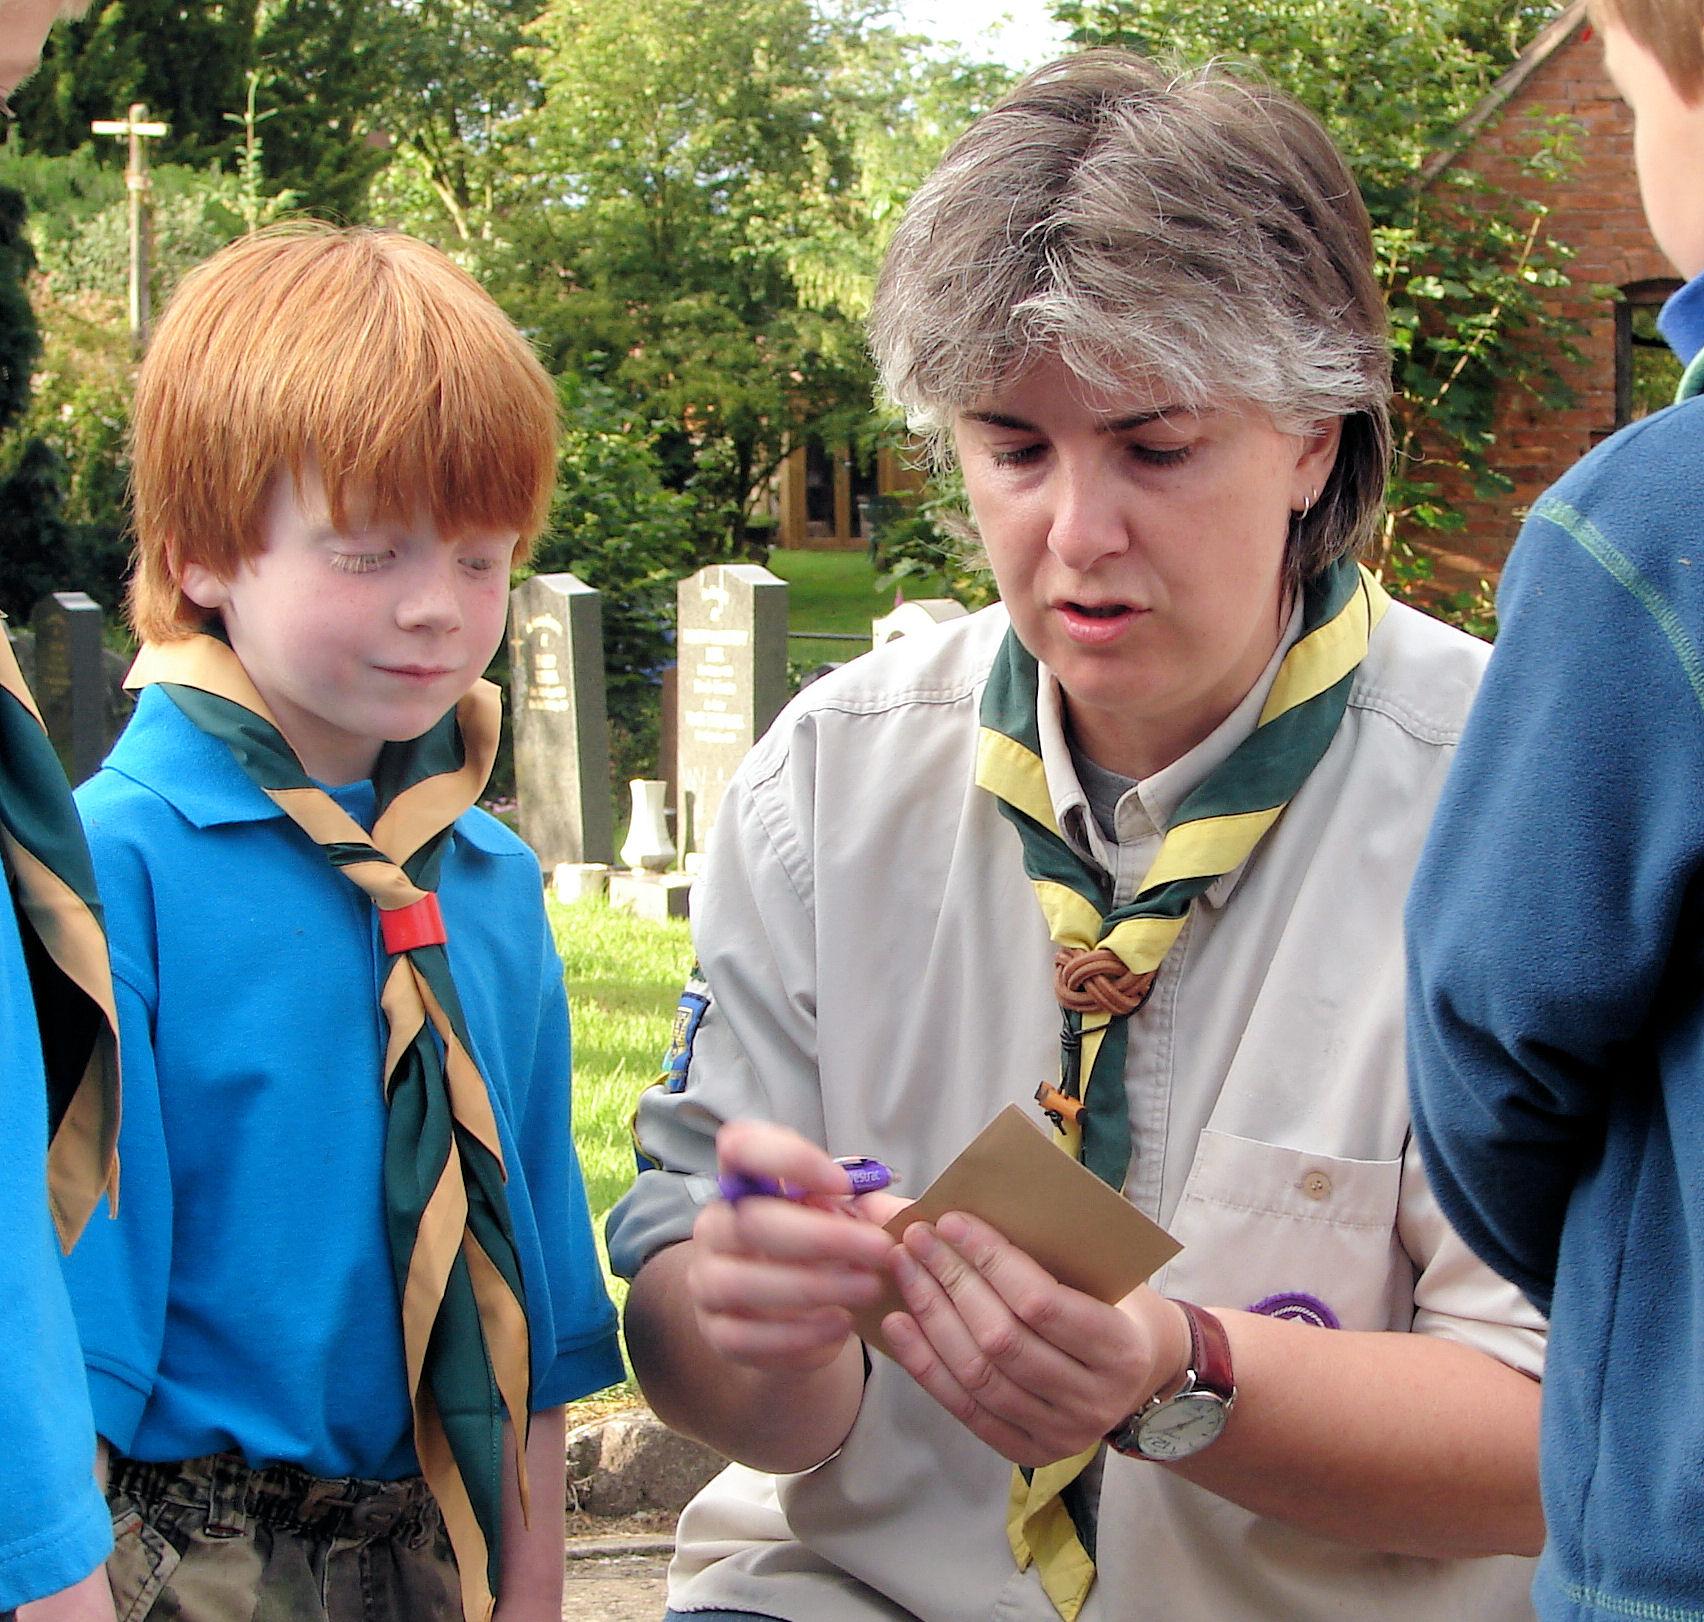 Ashington Group Meeting Hut: Hodnet - North Shropshire